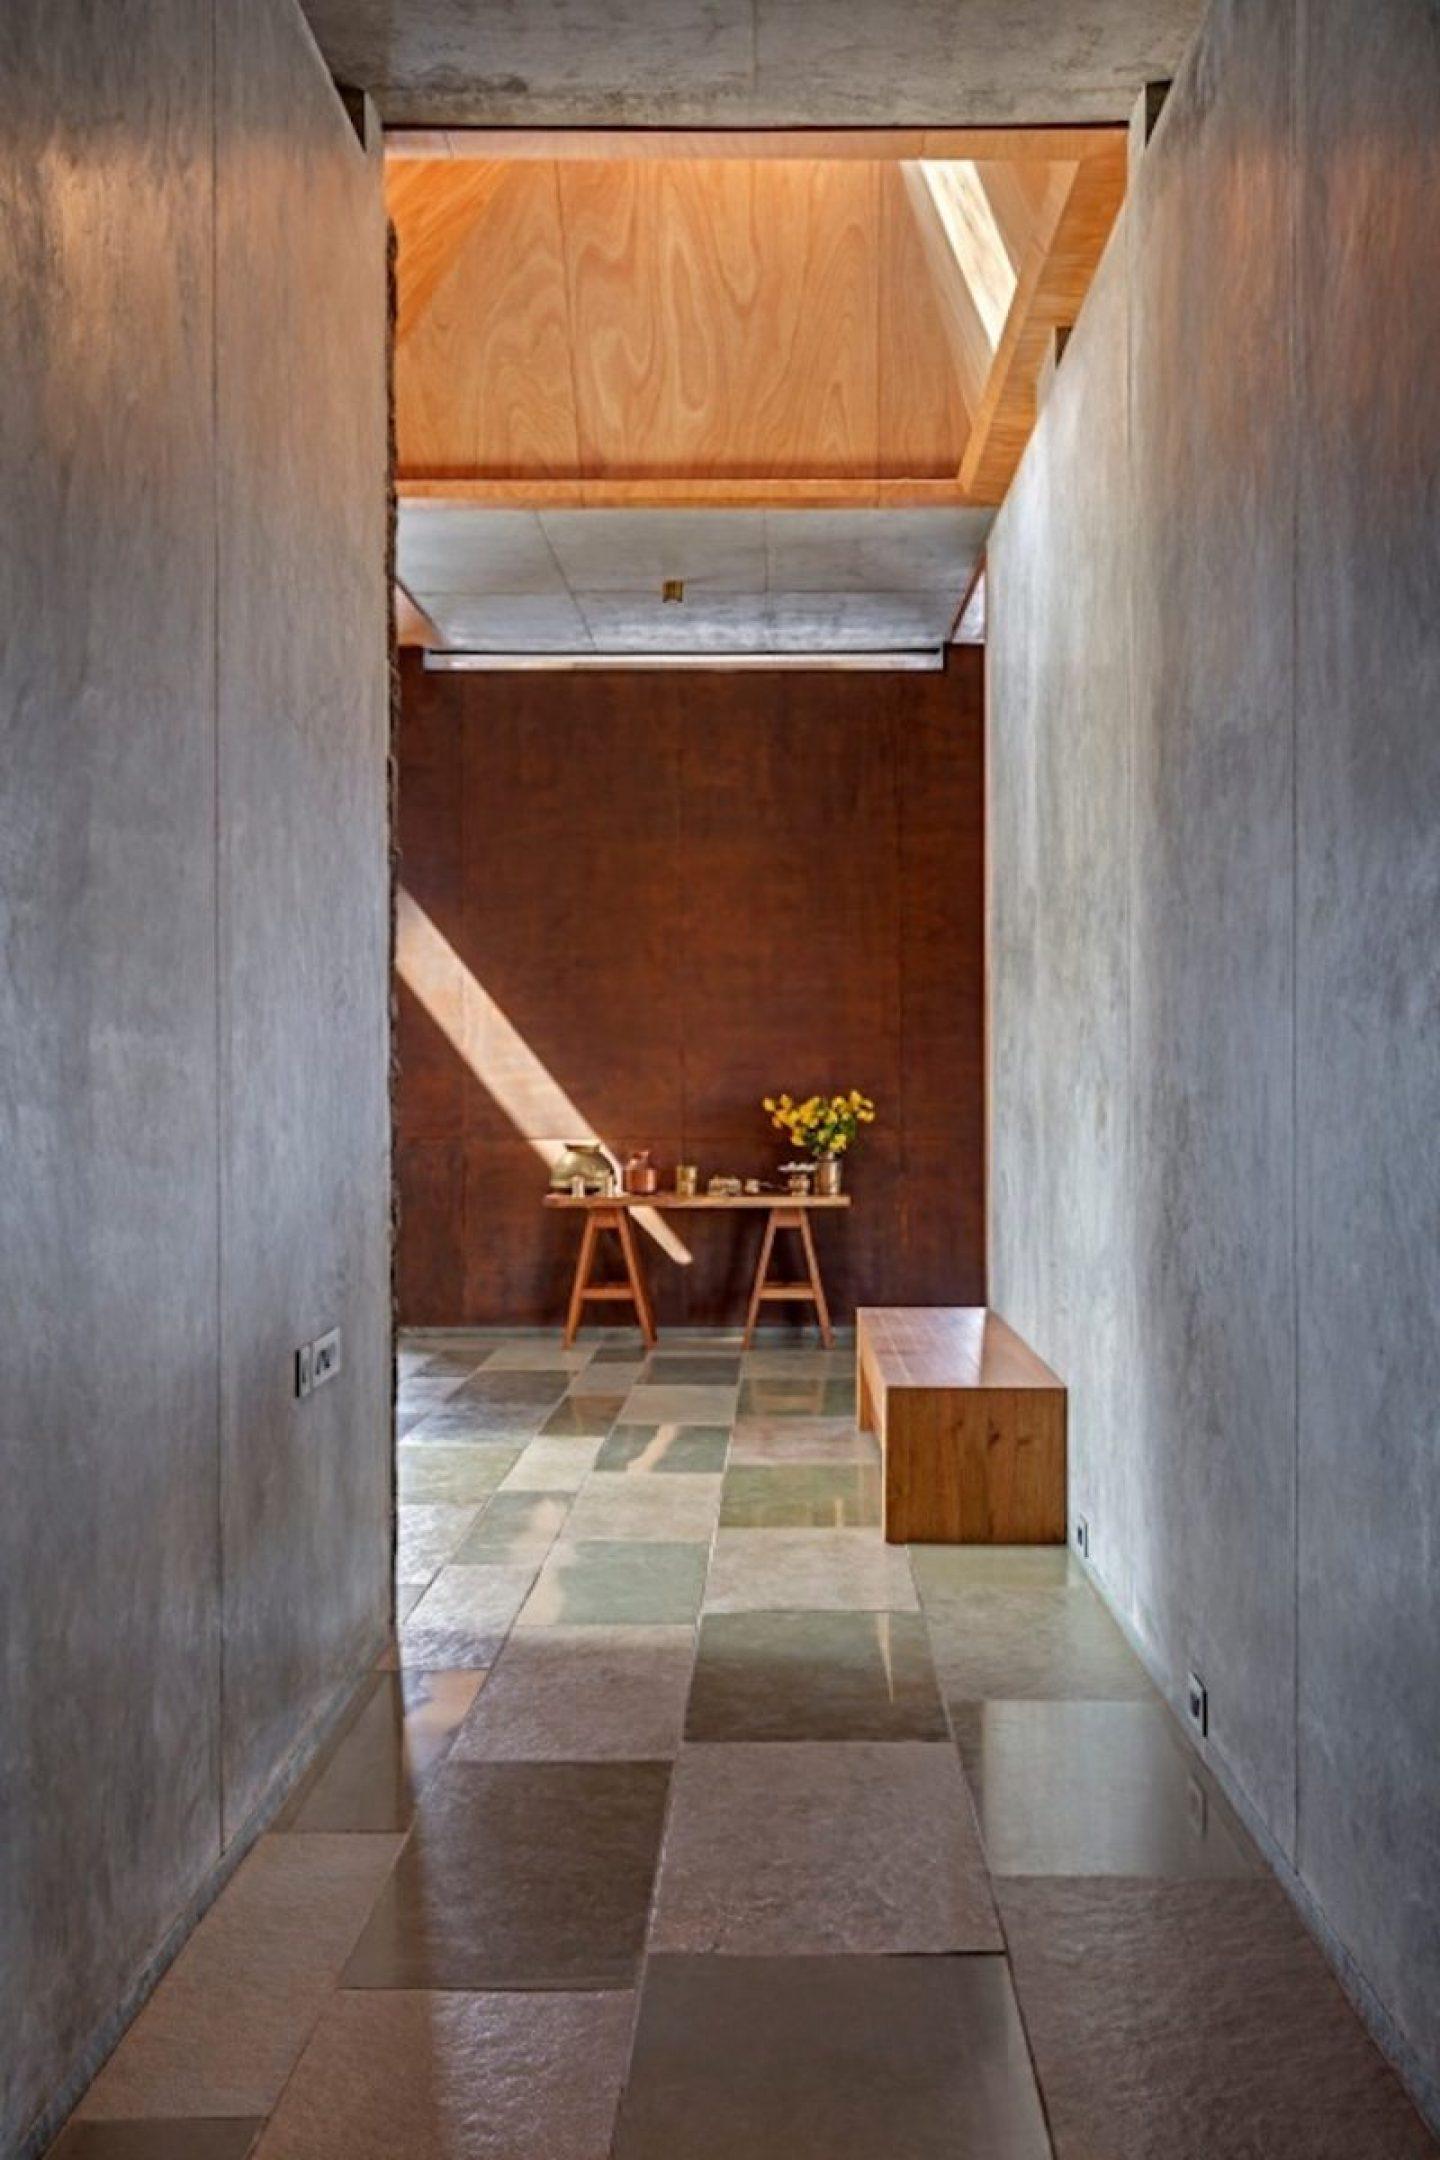 ignant_architecture_khosla_retreat_006